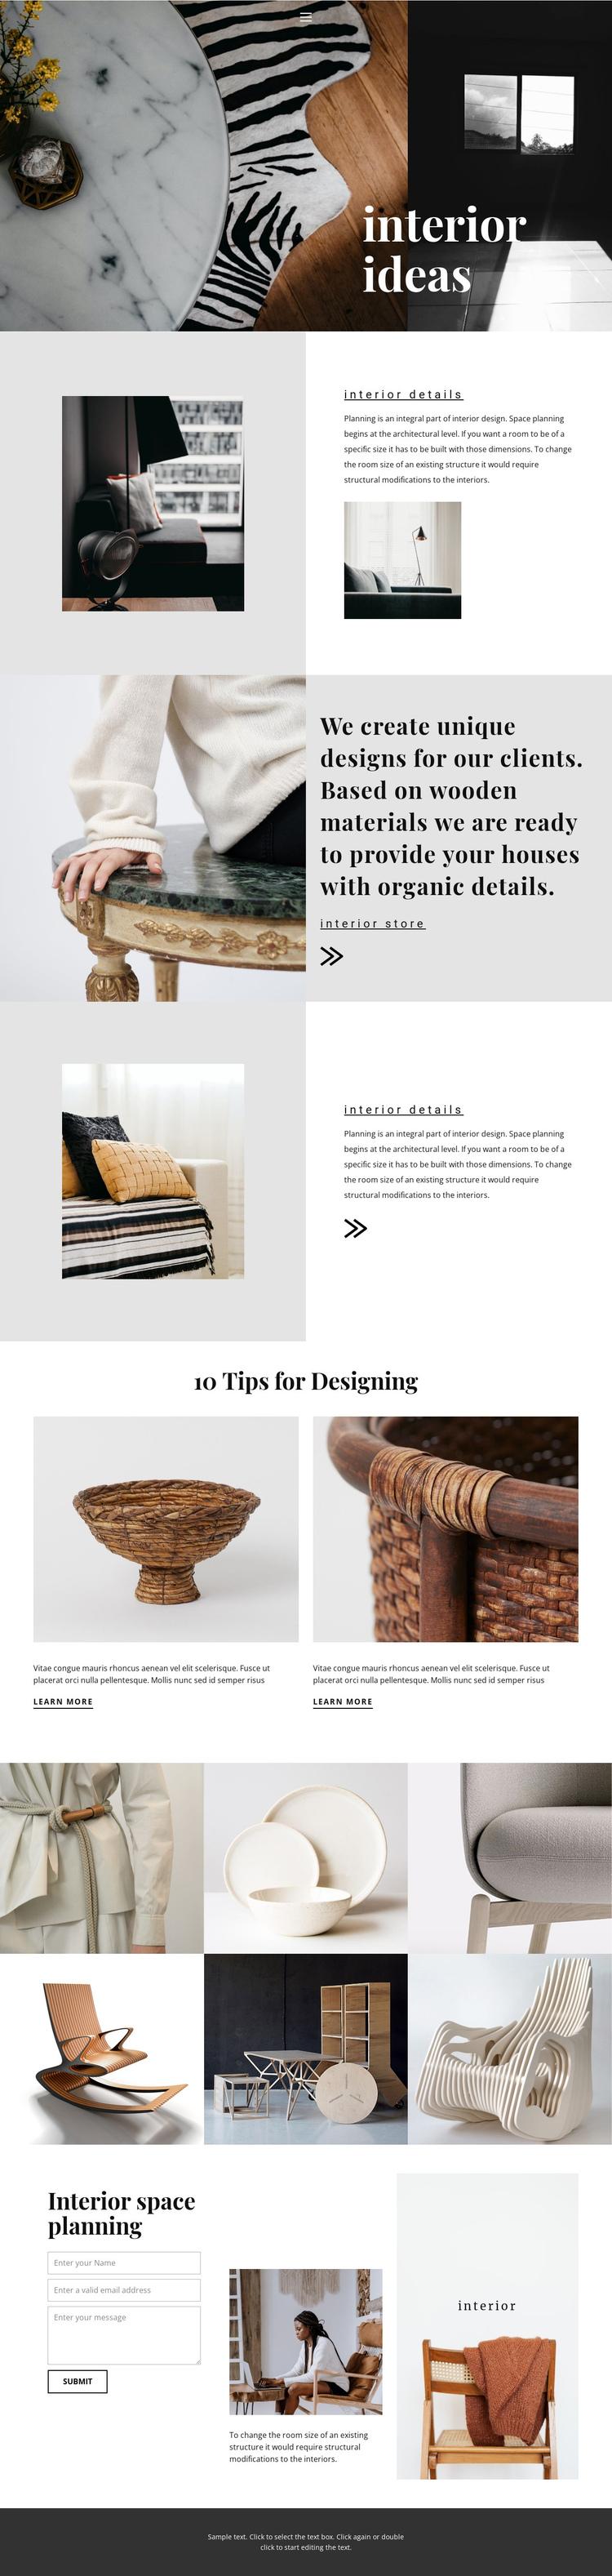 New interior ideas Website Builder Software